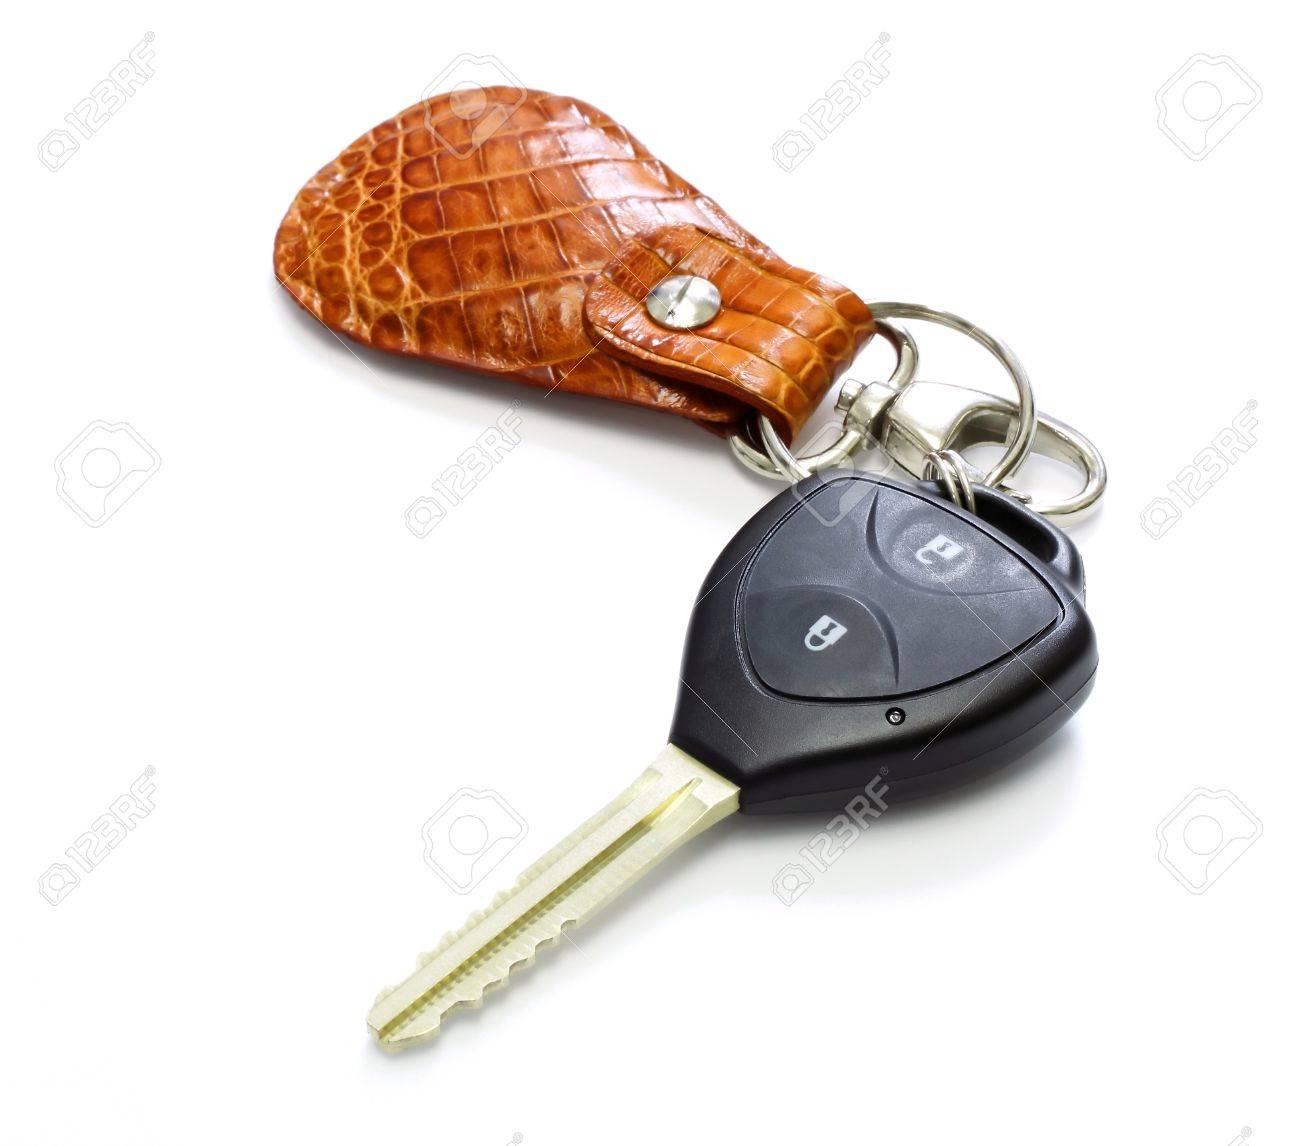 key car with remote , key chain Stock Photo - 10294553